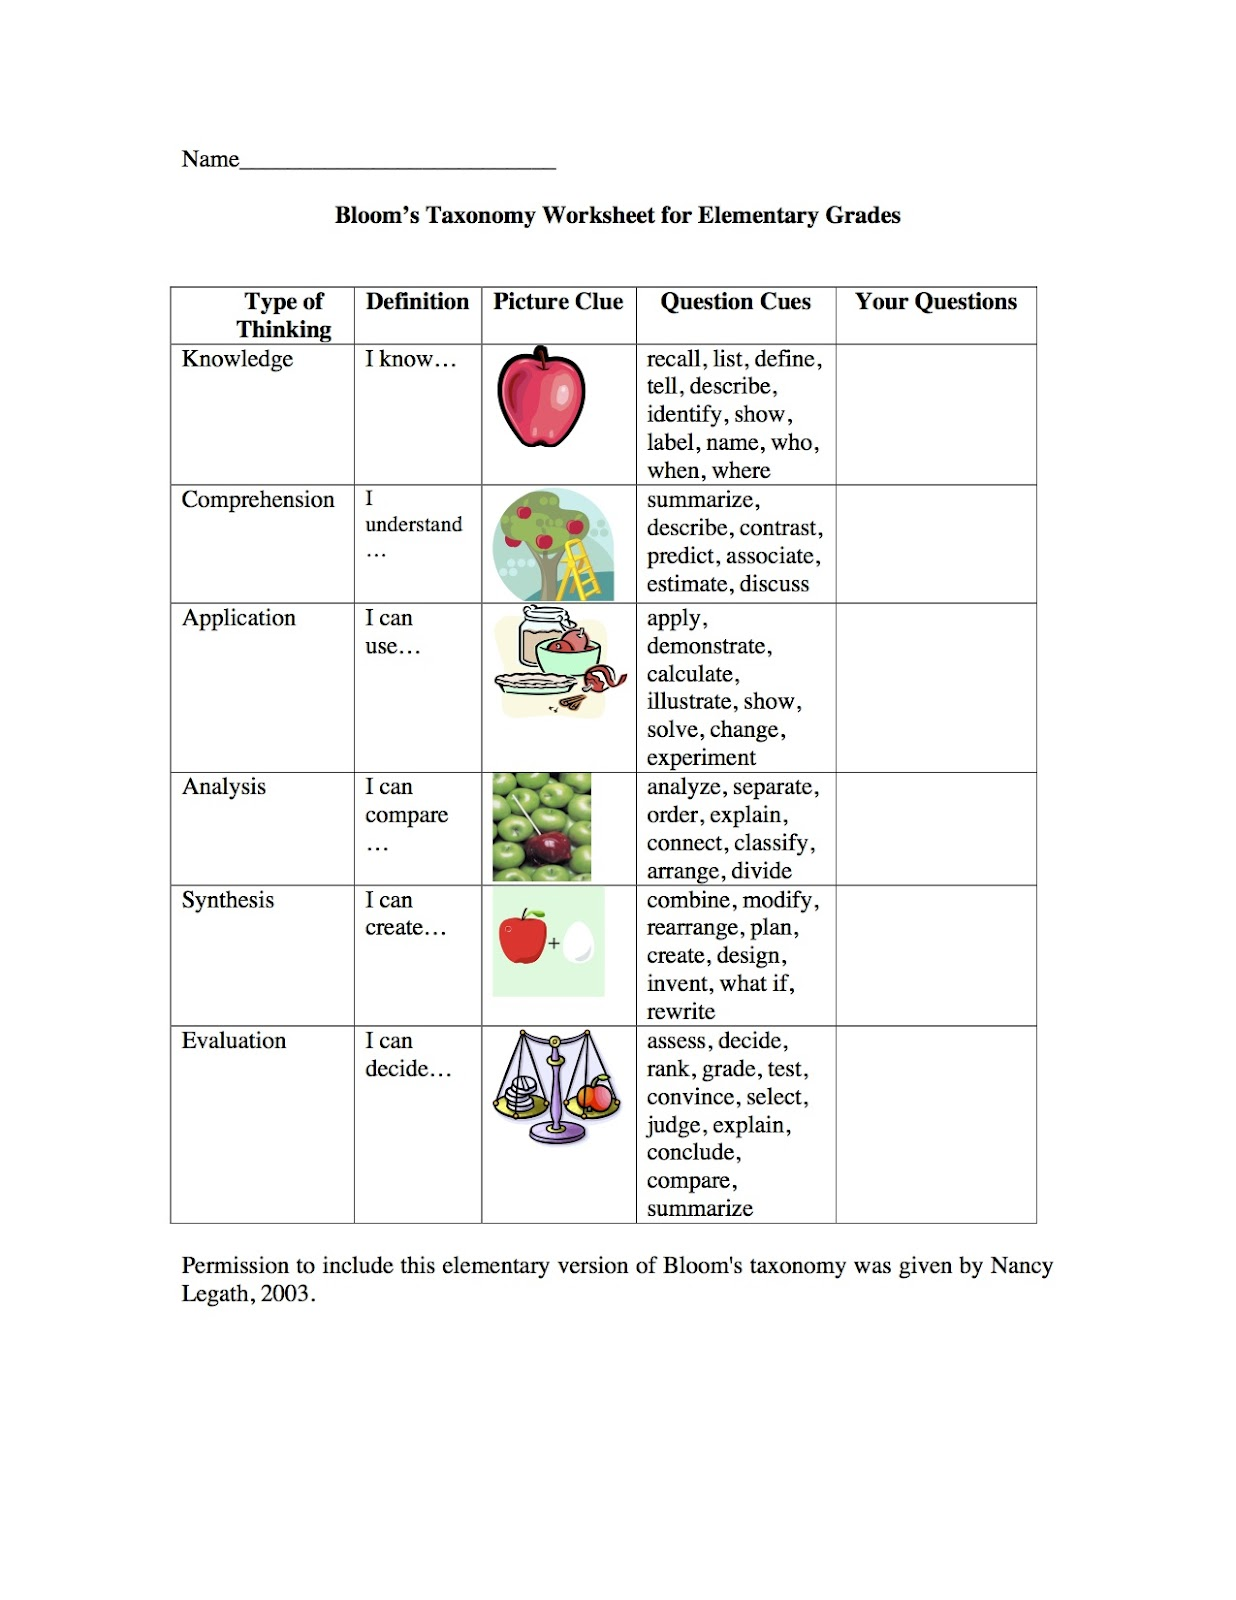 Plant Taxonomy Worksheet by Chris Yorke | Teachers Pay Teachers